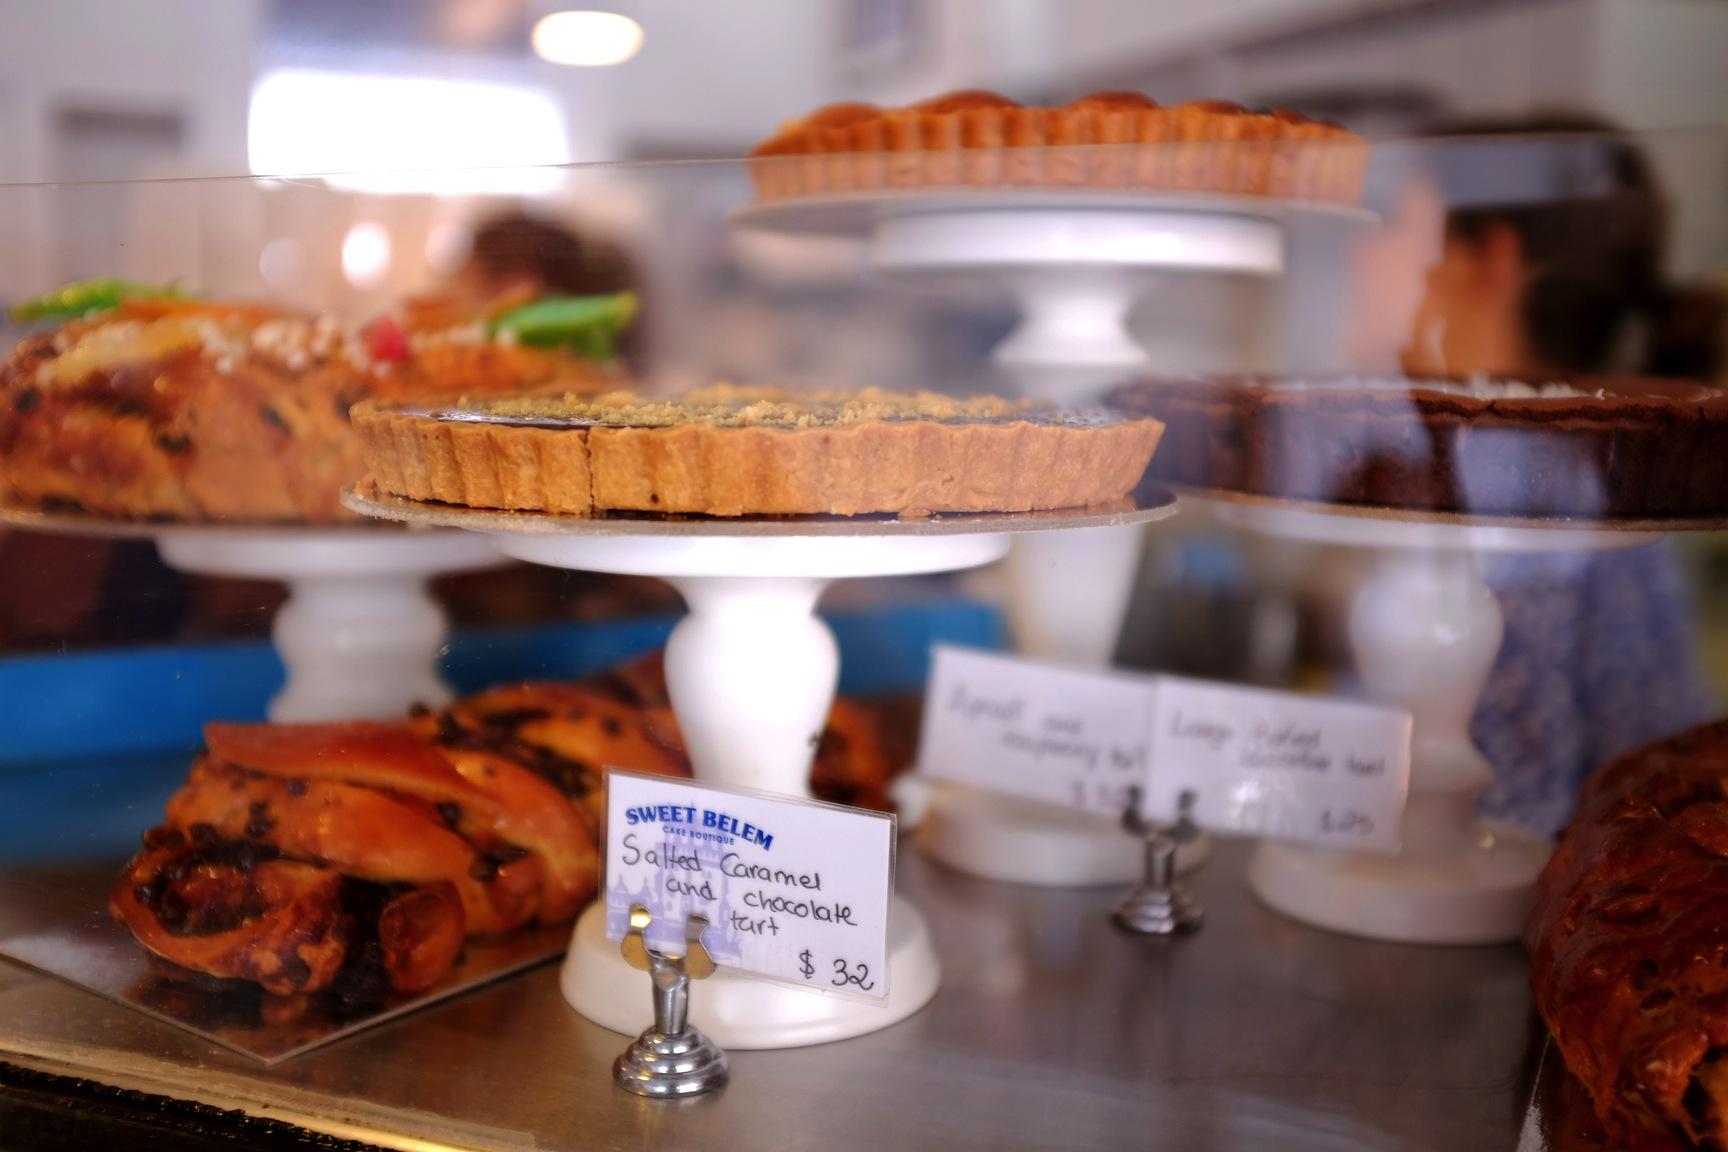 sweet belem cake boutique, sweet belem, sweet belem petersham, portuguese tarts, portuguese sydney, petersham cakes, sydney foodie, sydney eats, portuguese food, sydney blogger, nezuki, dessert, pastry, sweet, cakes